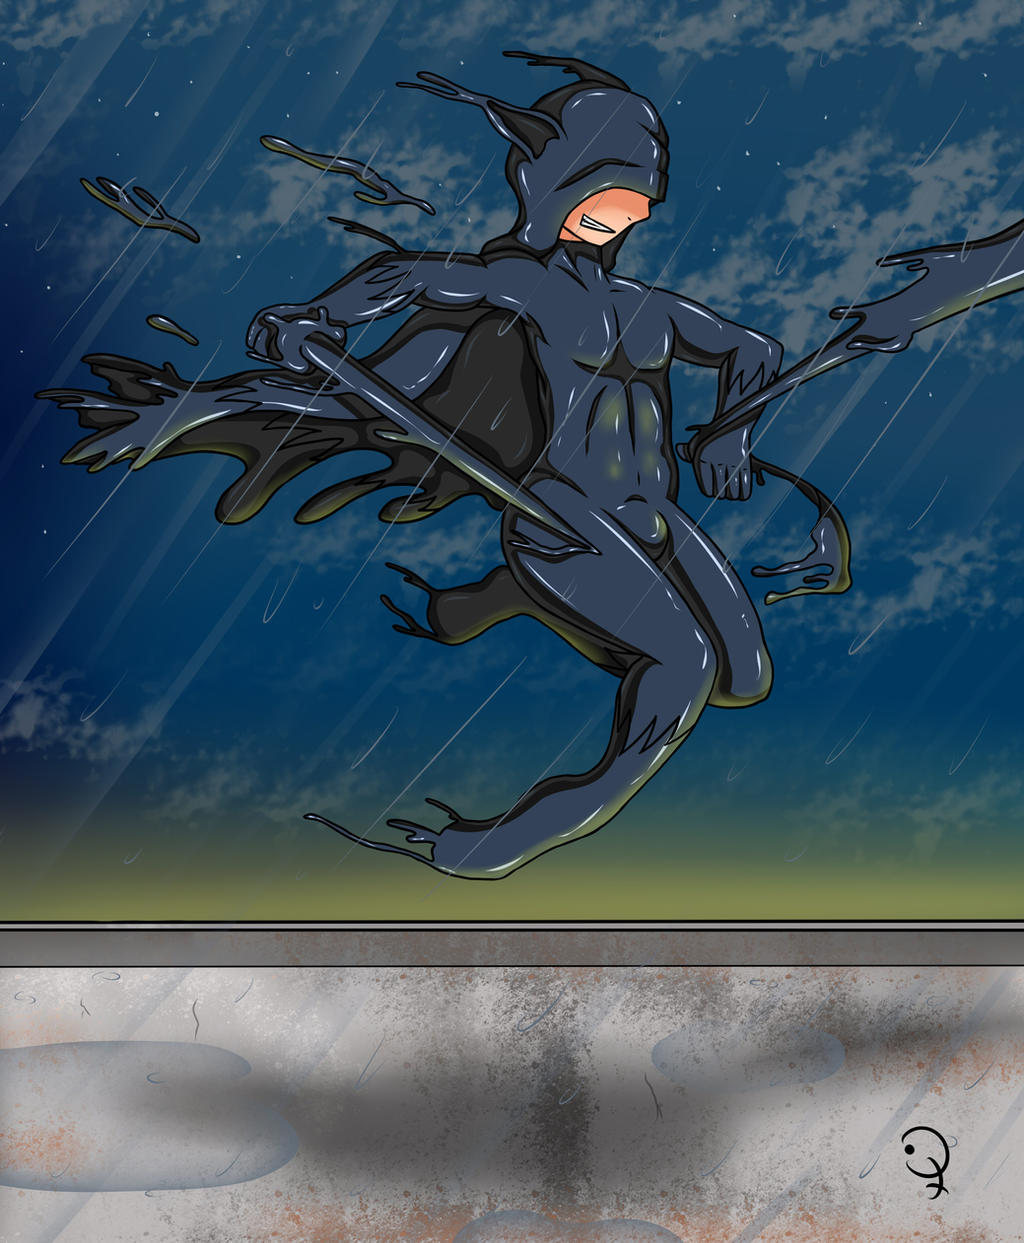 Black Suit Fox by KurtType5